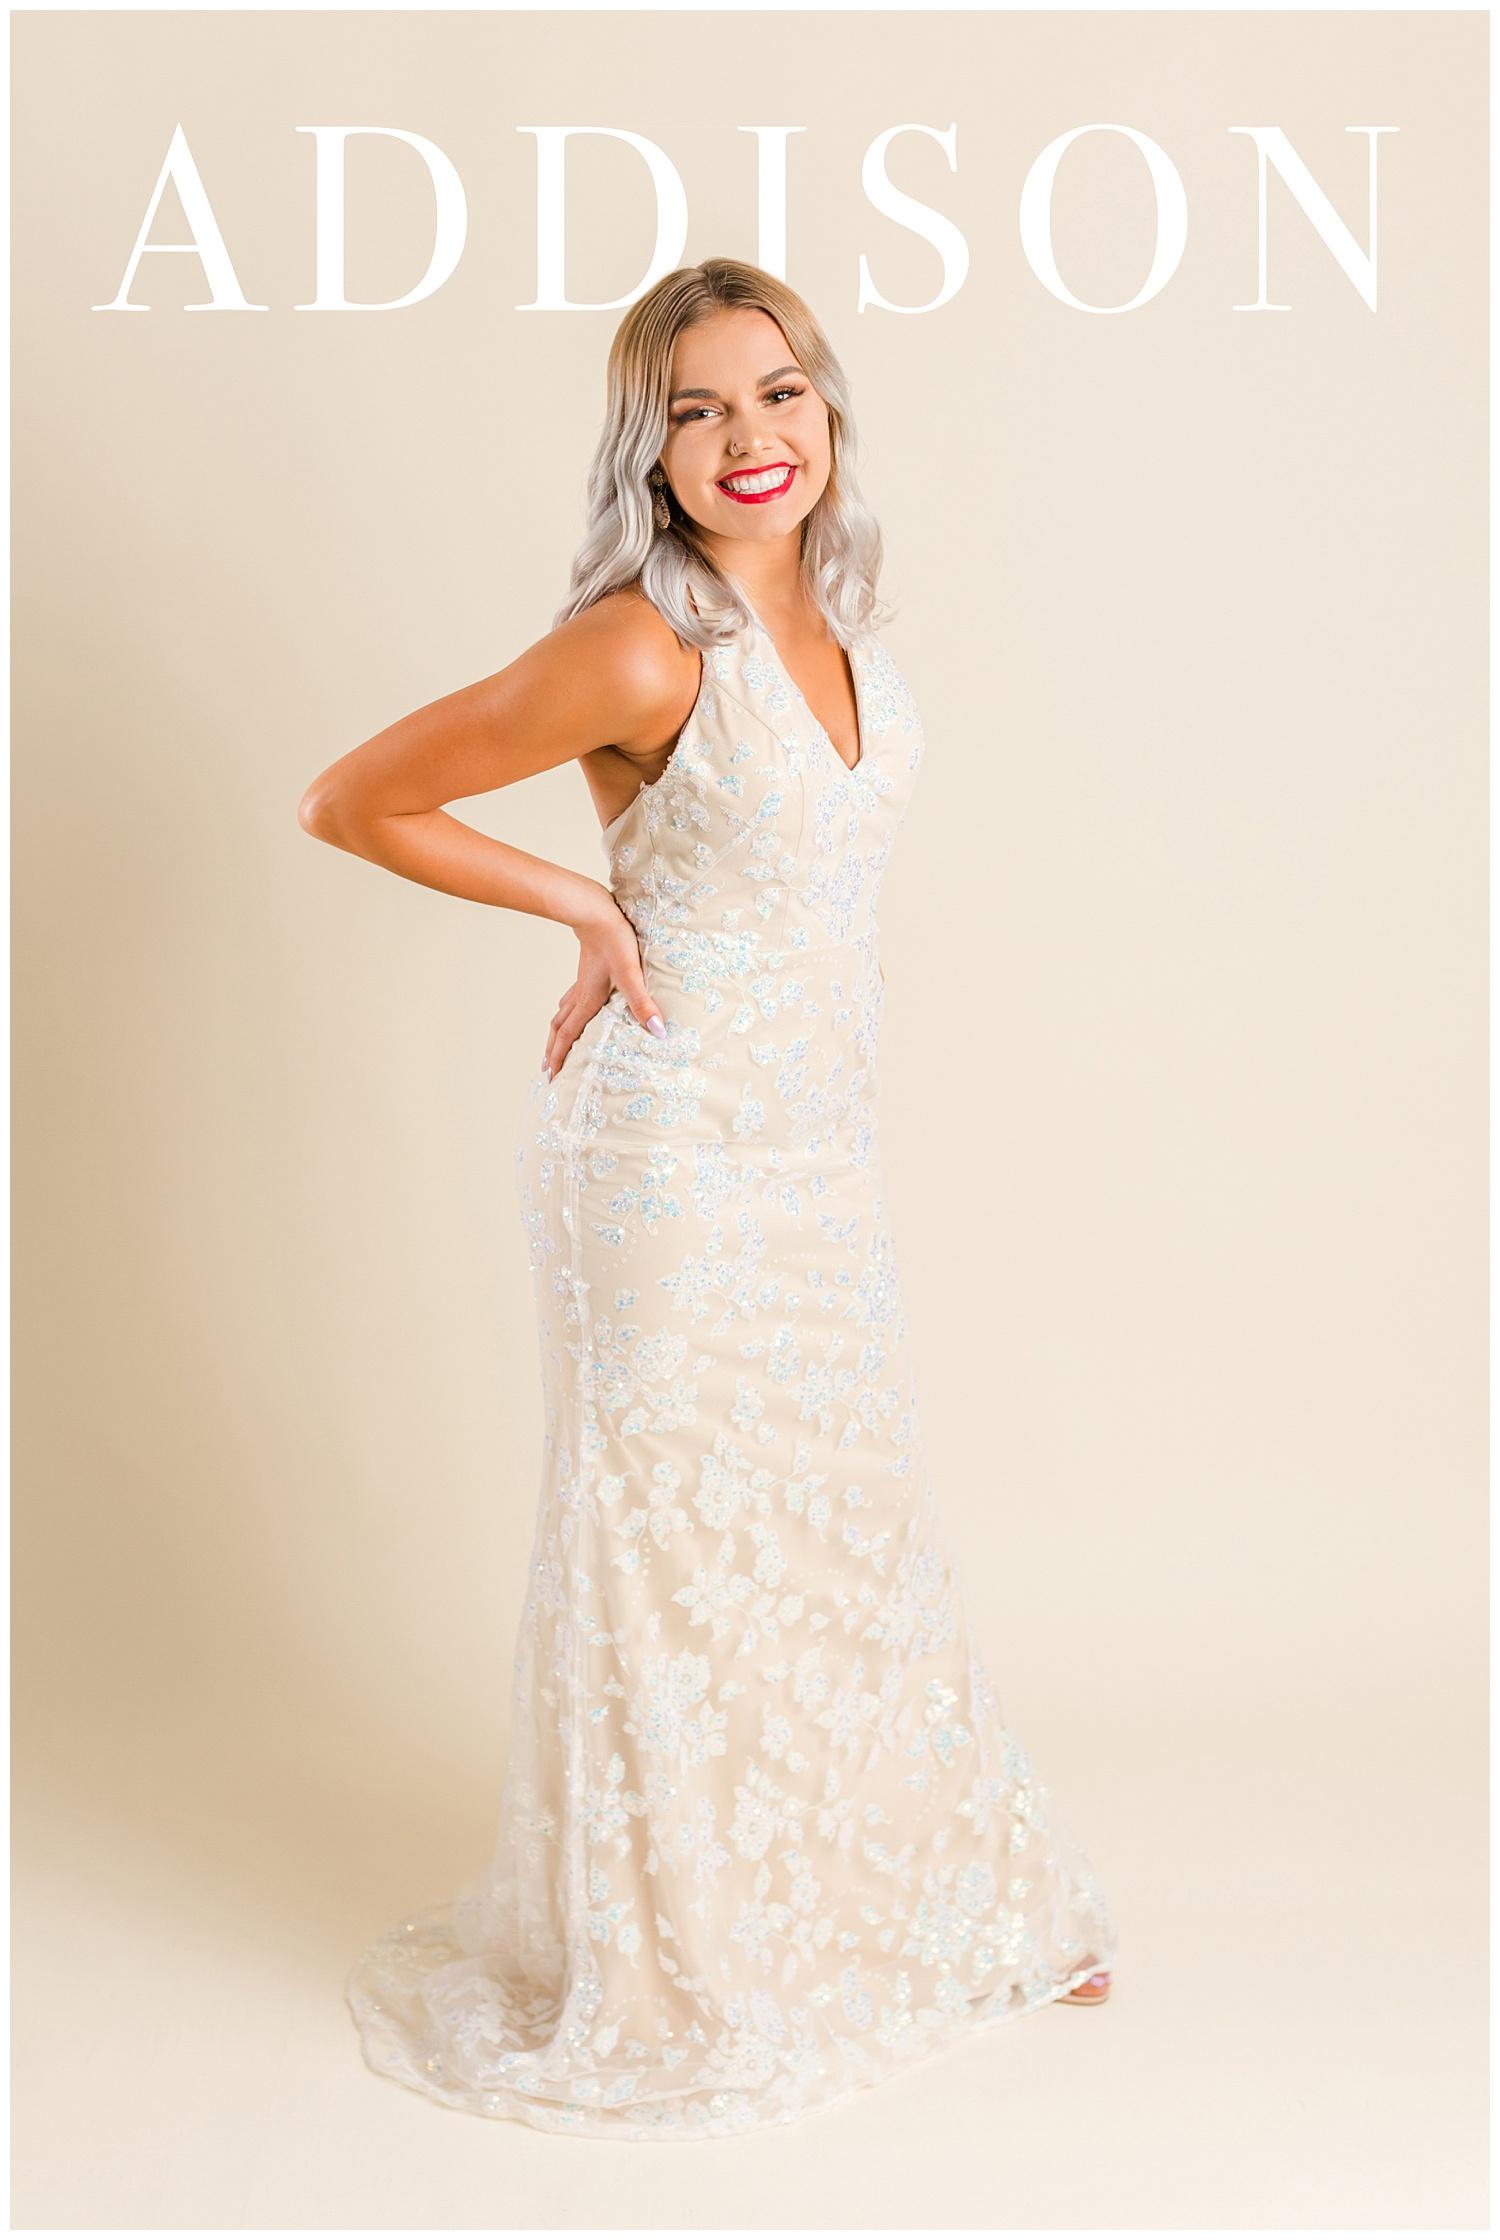 Addison poses in a Colette prom dress for a magazine cover | CB Studio